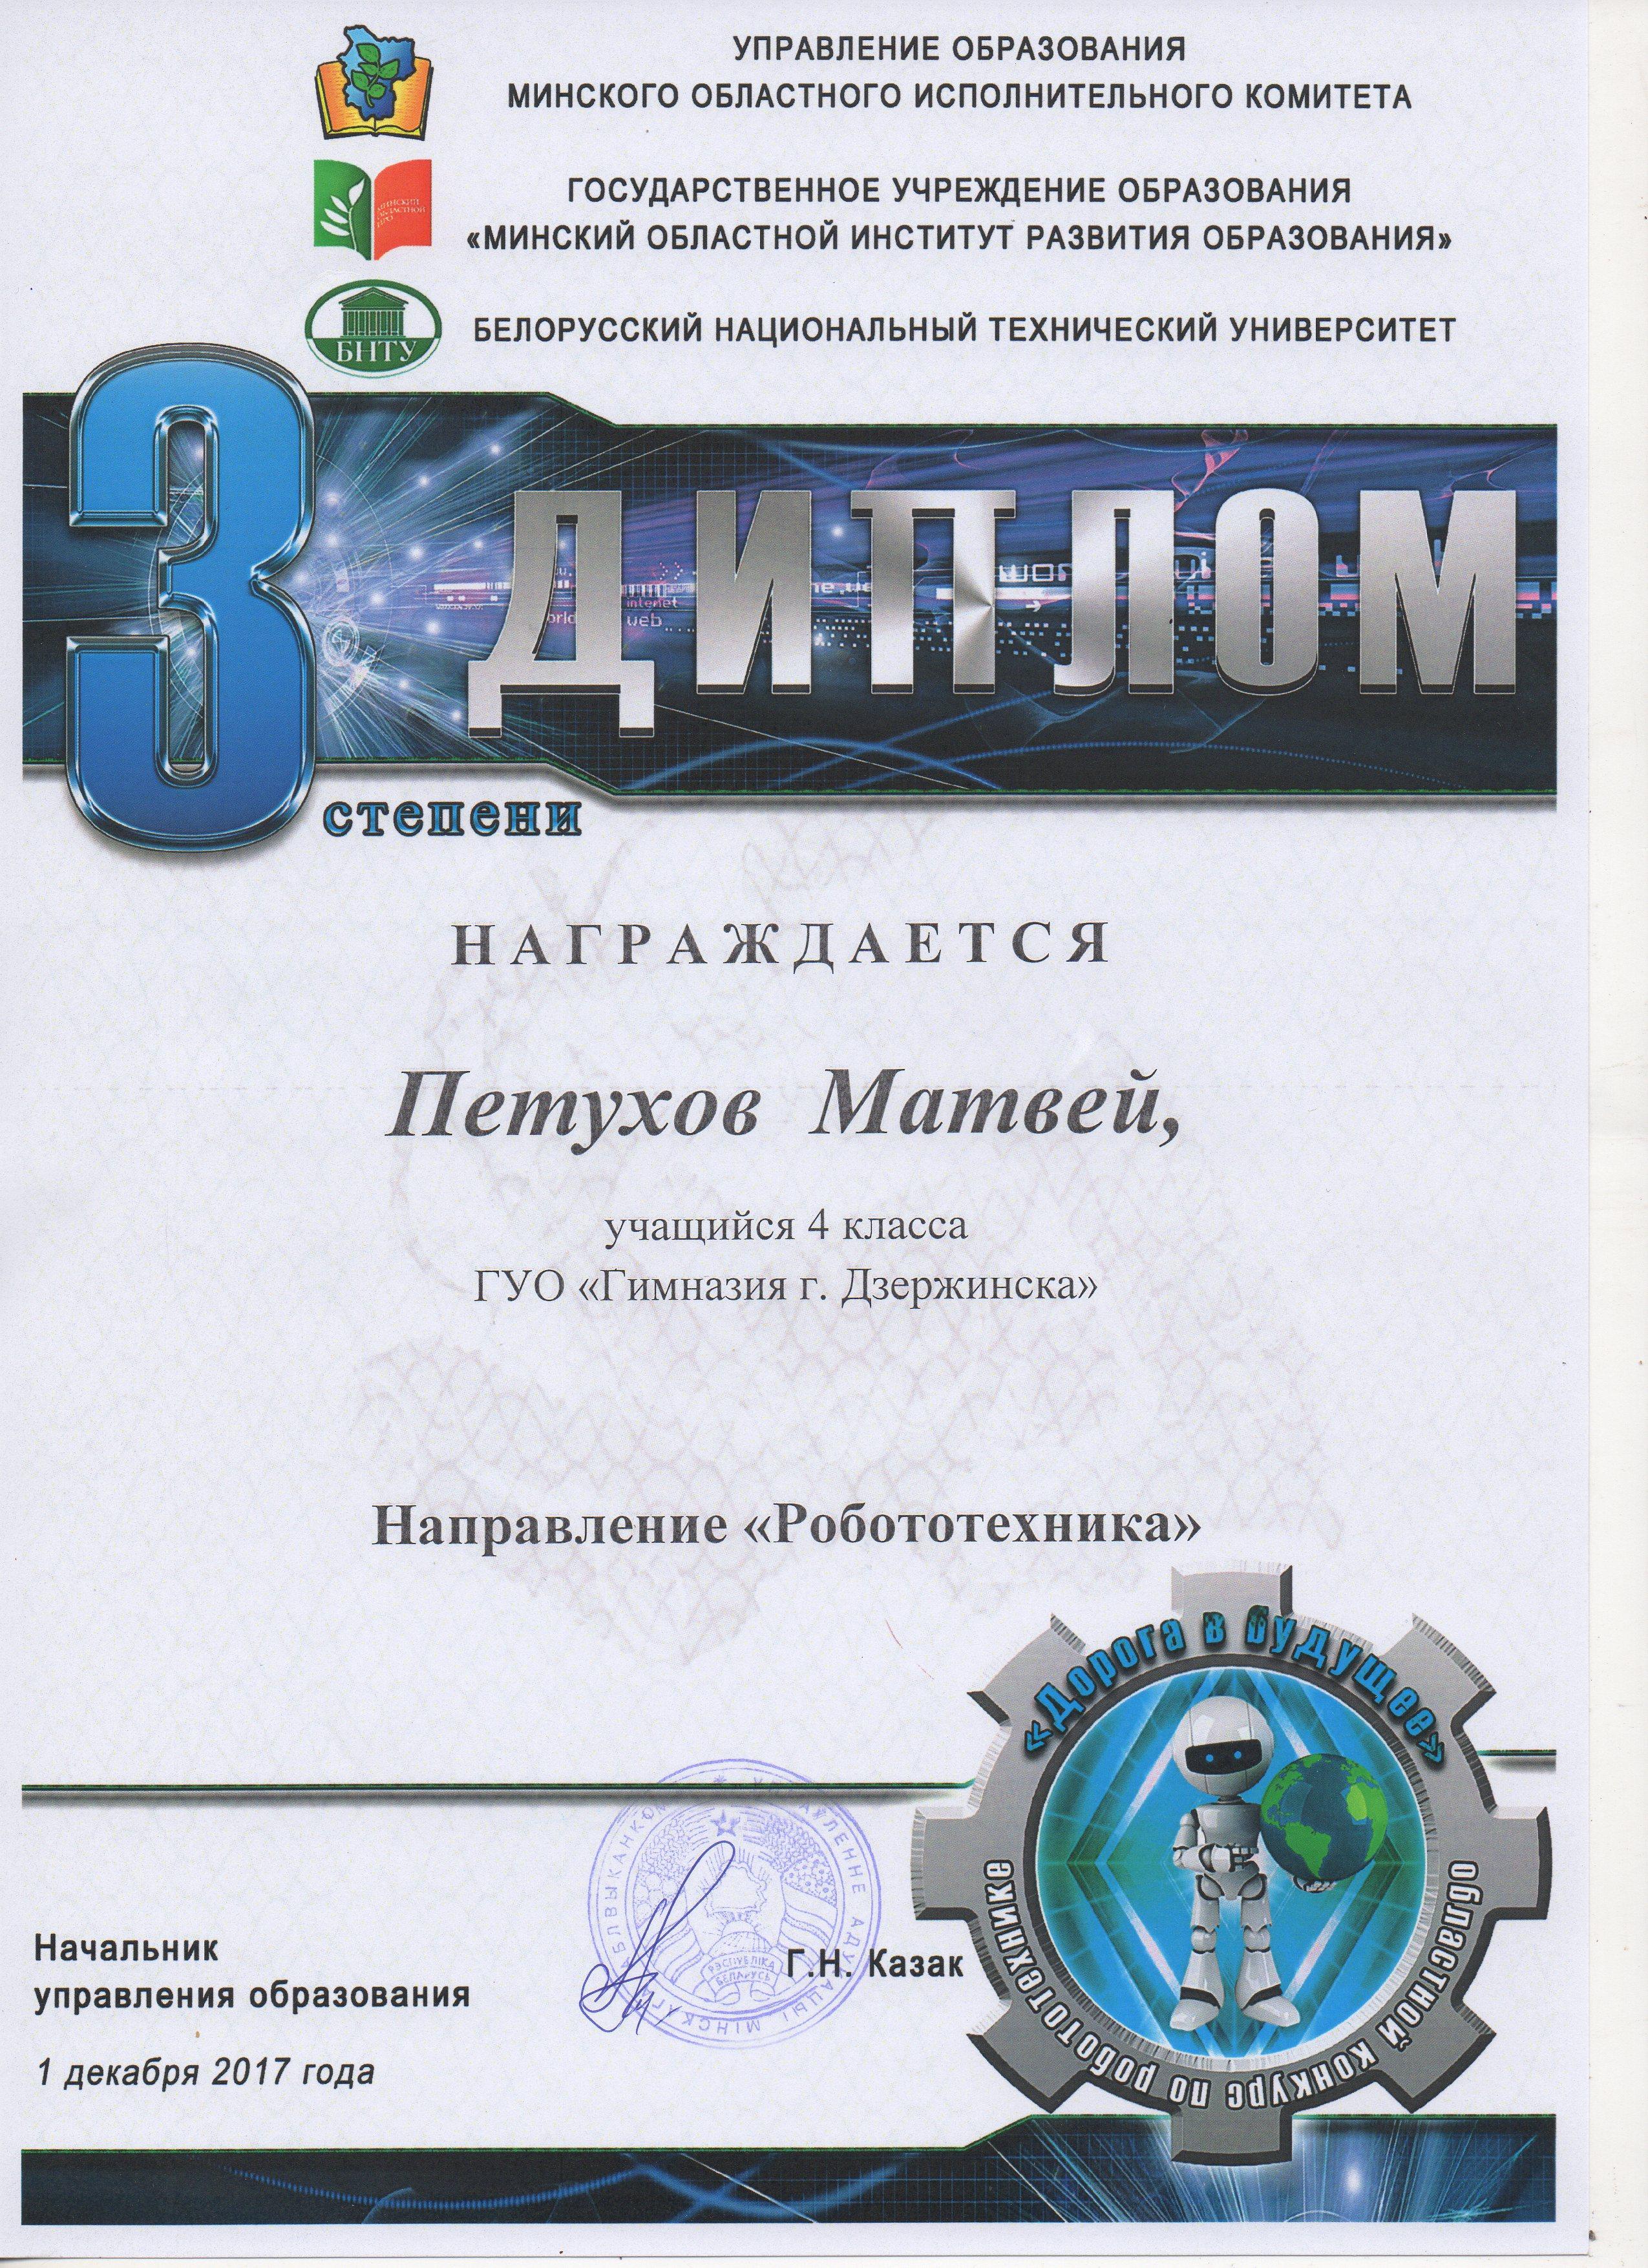 img2061